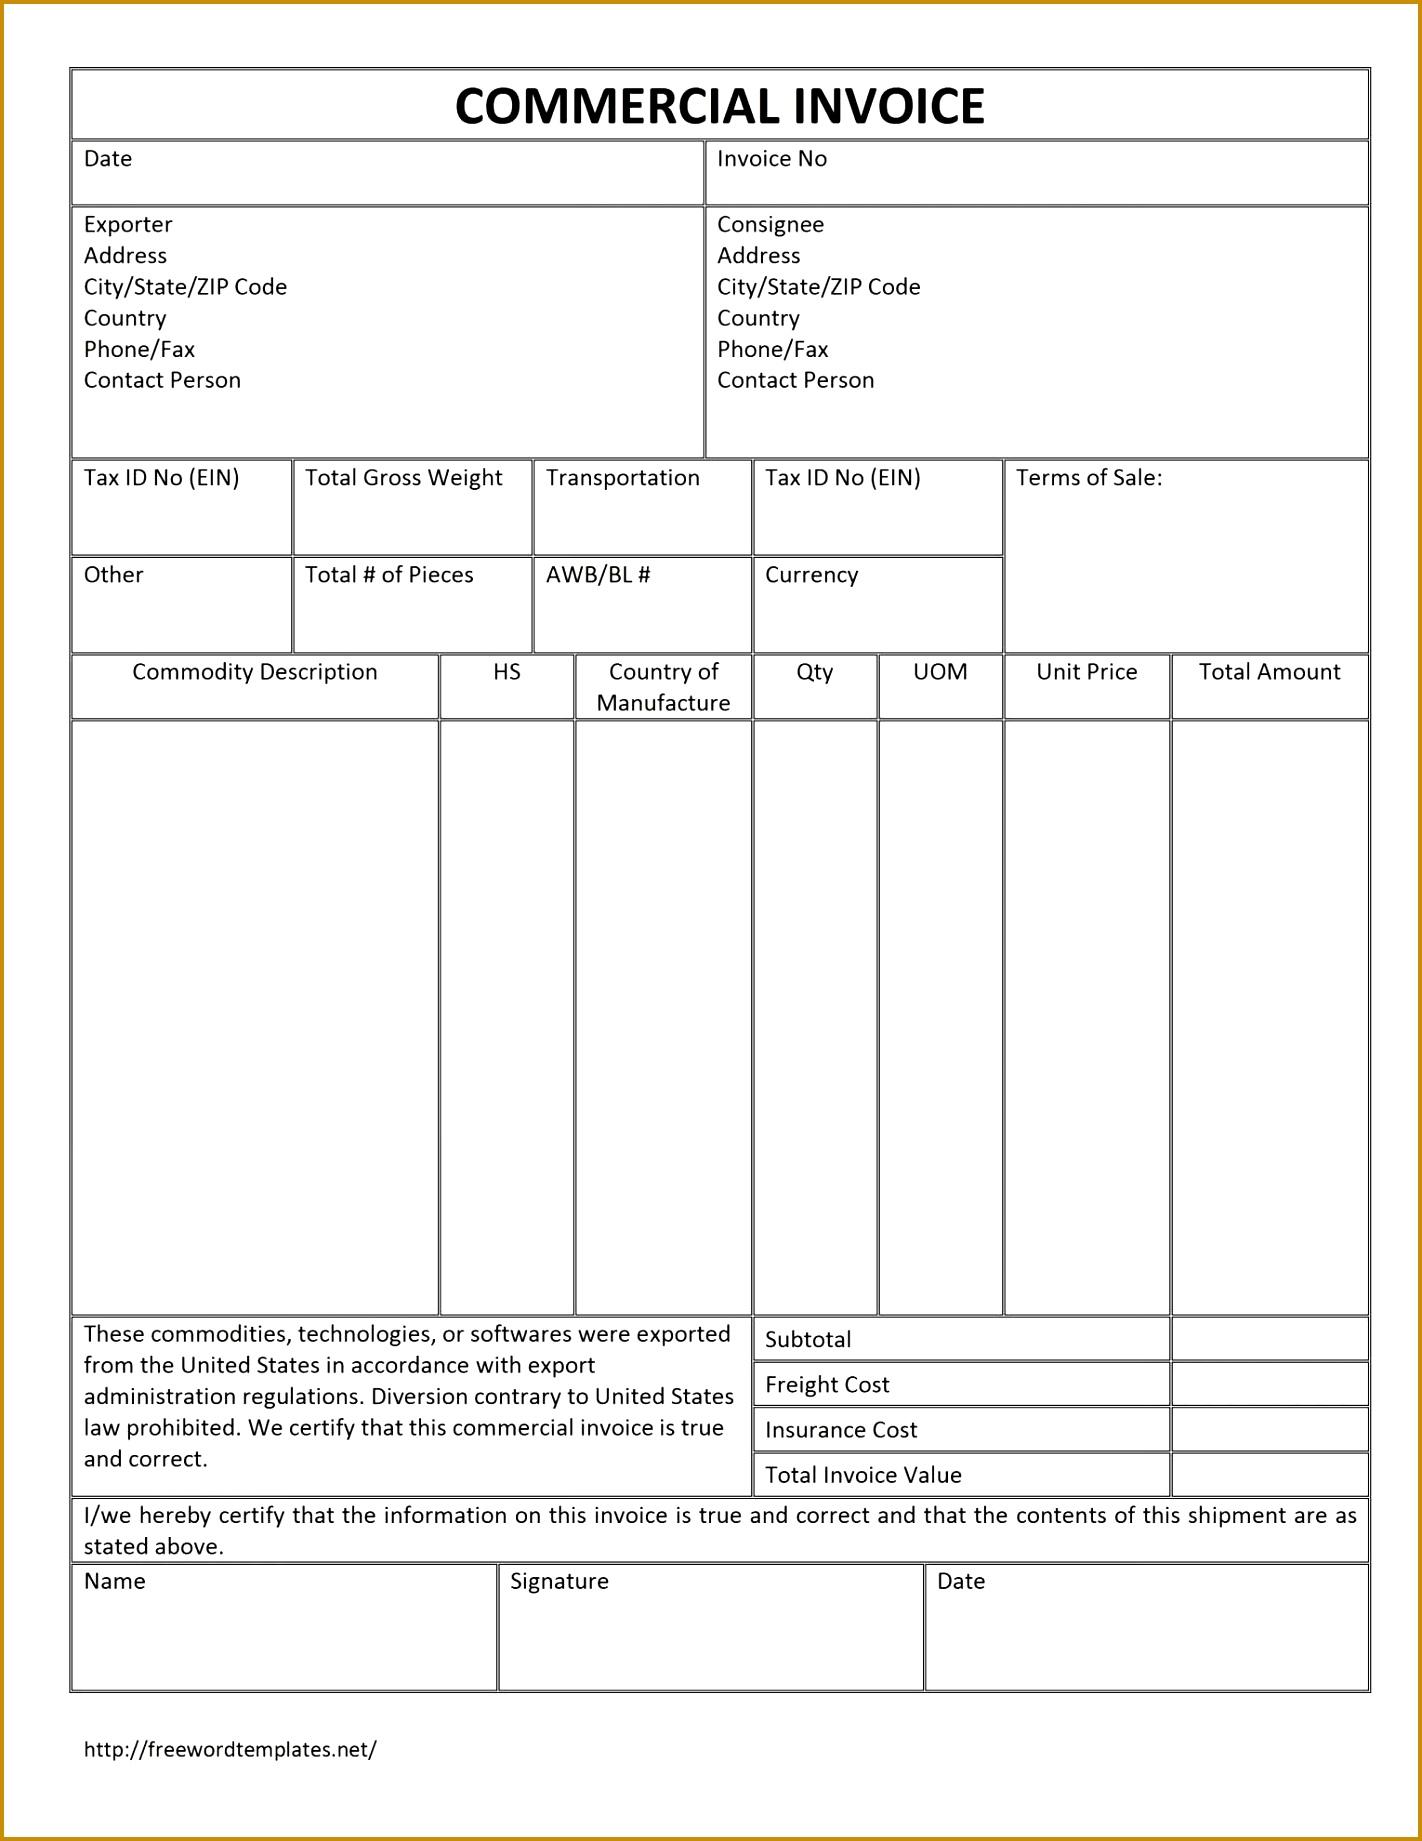 Pest Control Service Invoice Unique Microsoft Invoices Templates Free and Sample Export Invoice format Pest 18411422